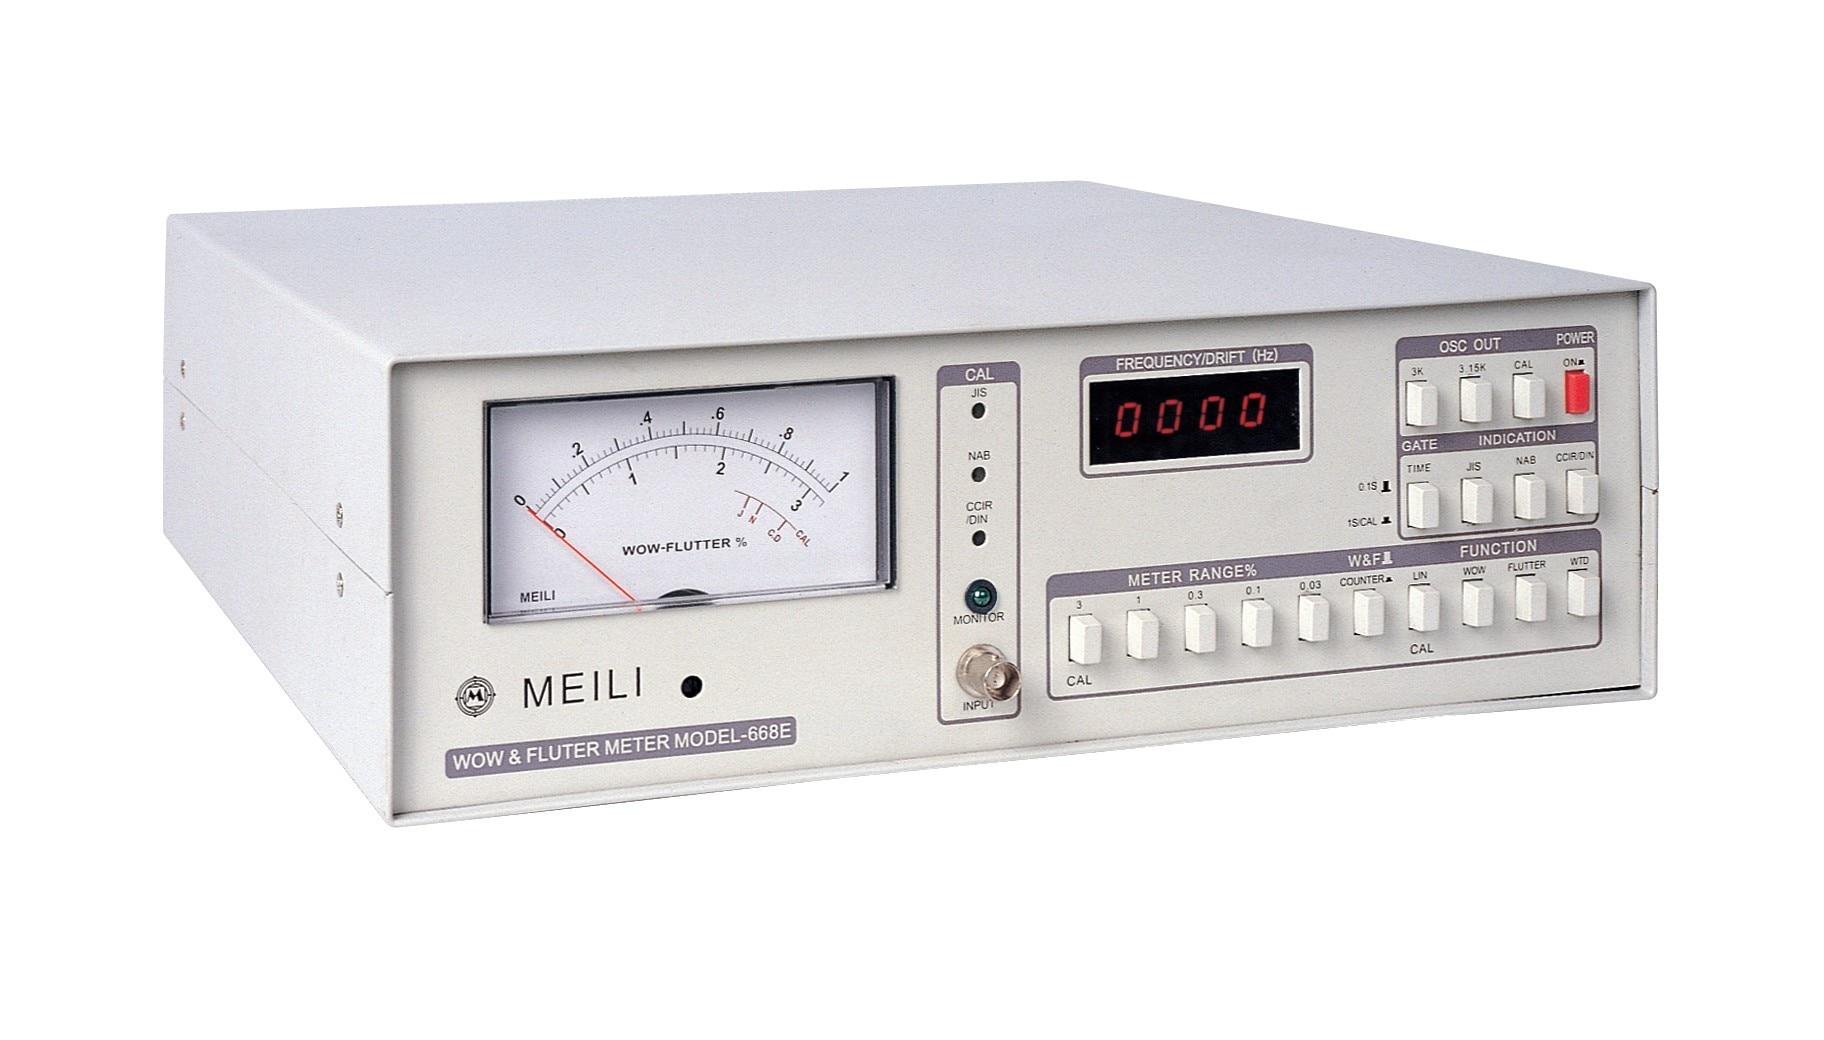 668E WoW и флаттер скорость тестер CD DVD смятение тестер измерения частоты: 10 9999 Гц